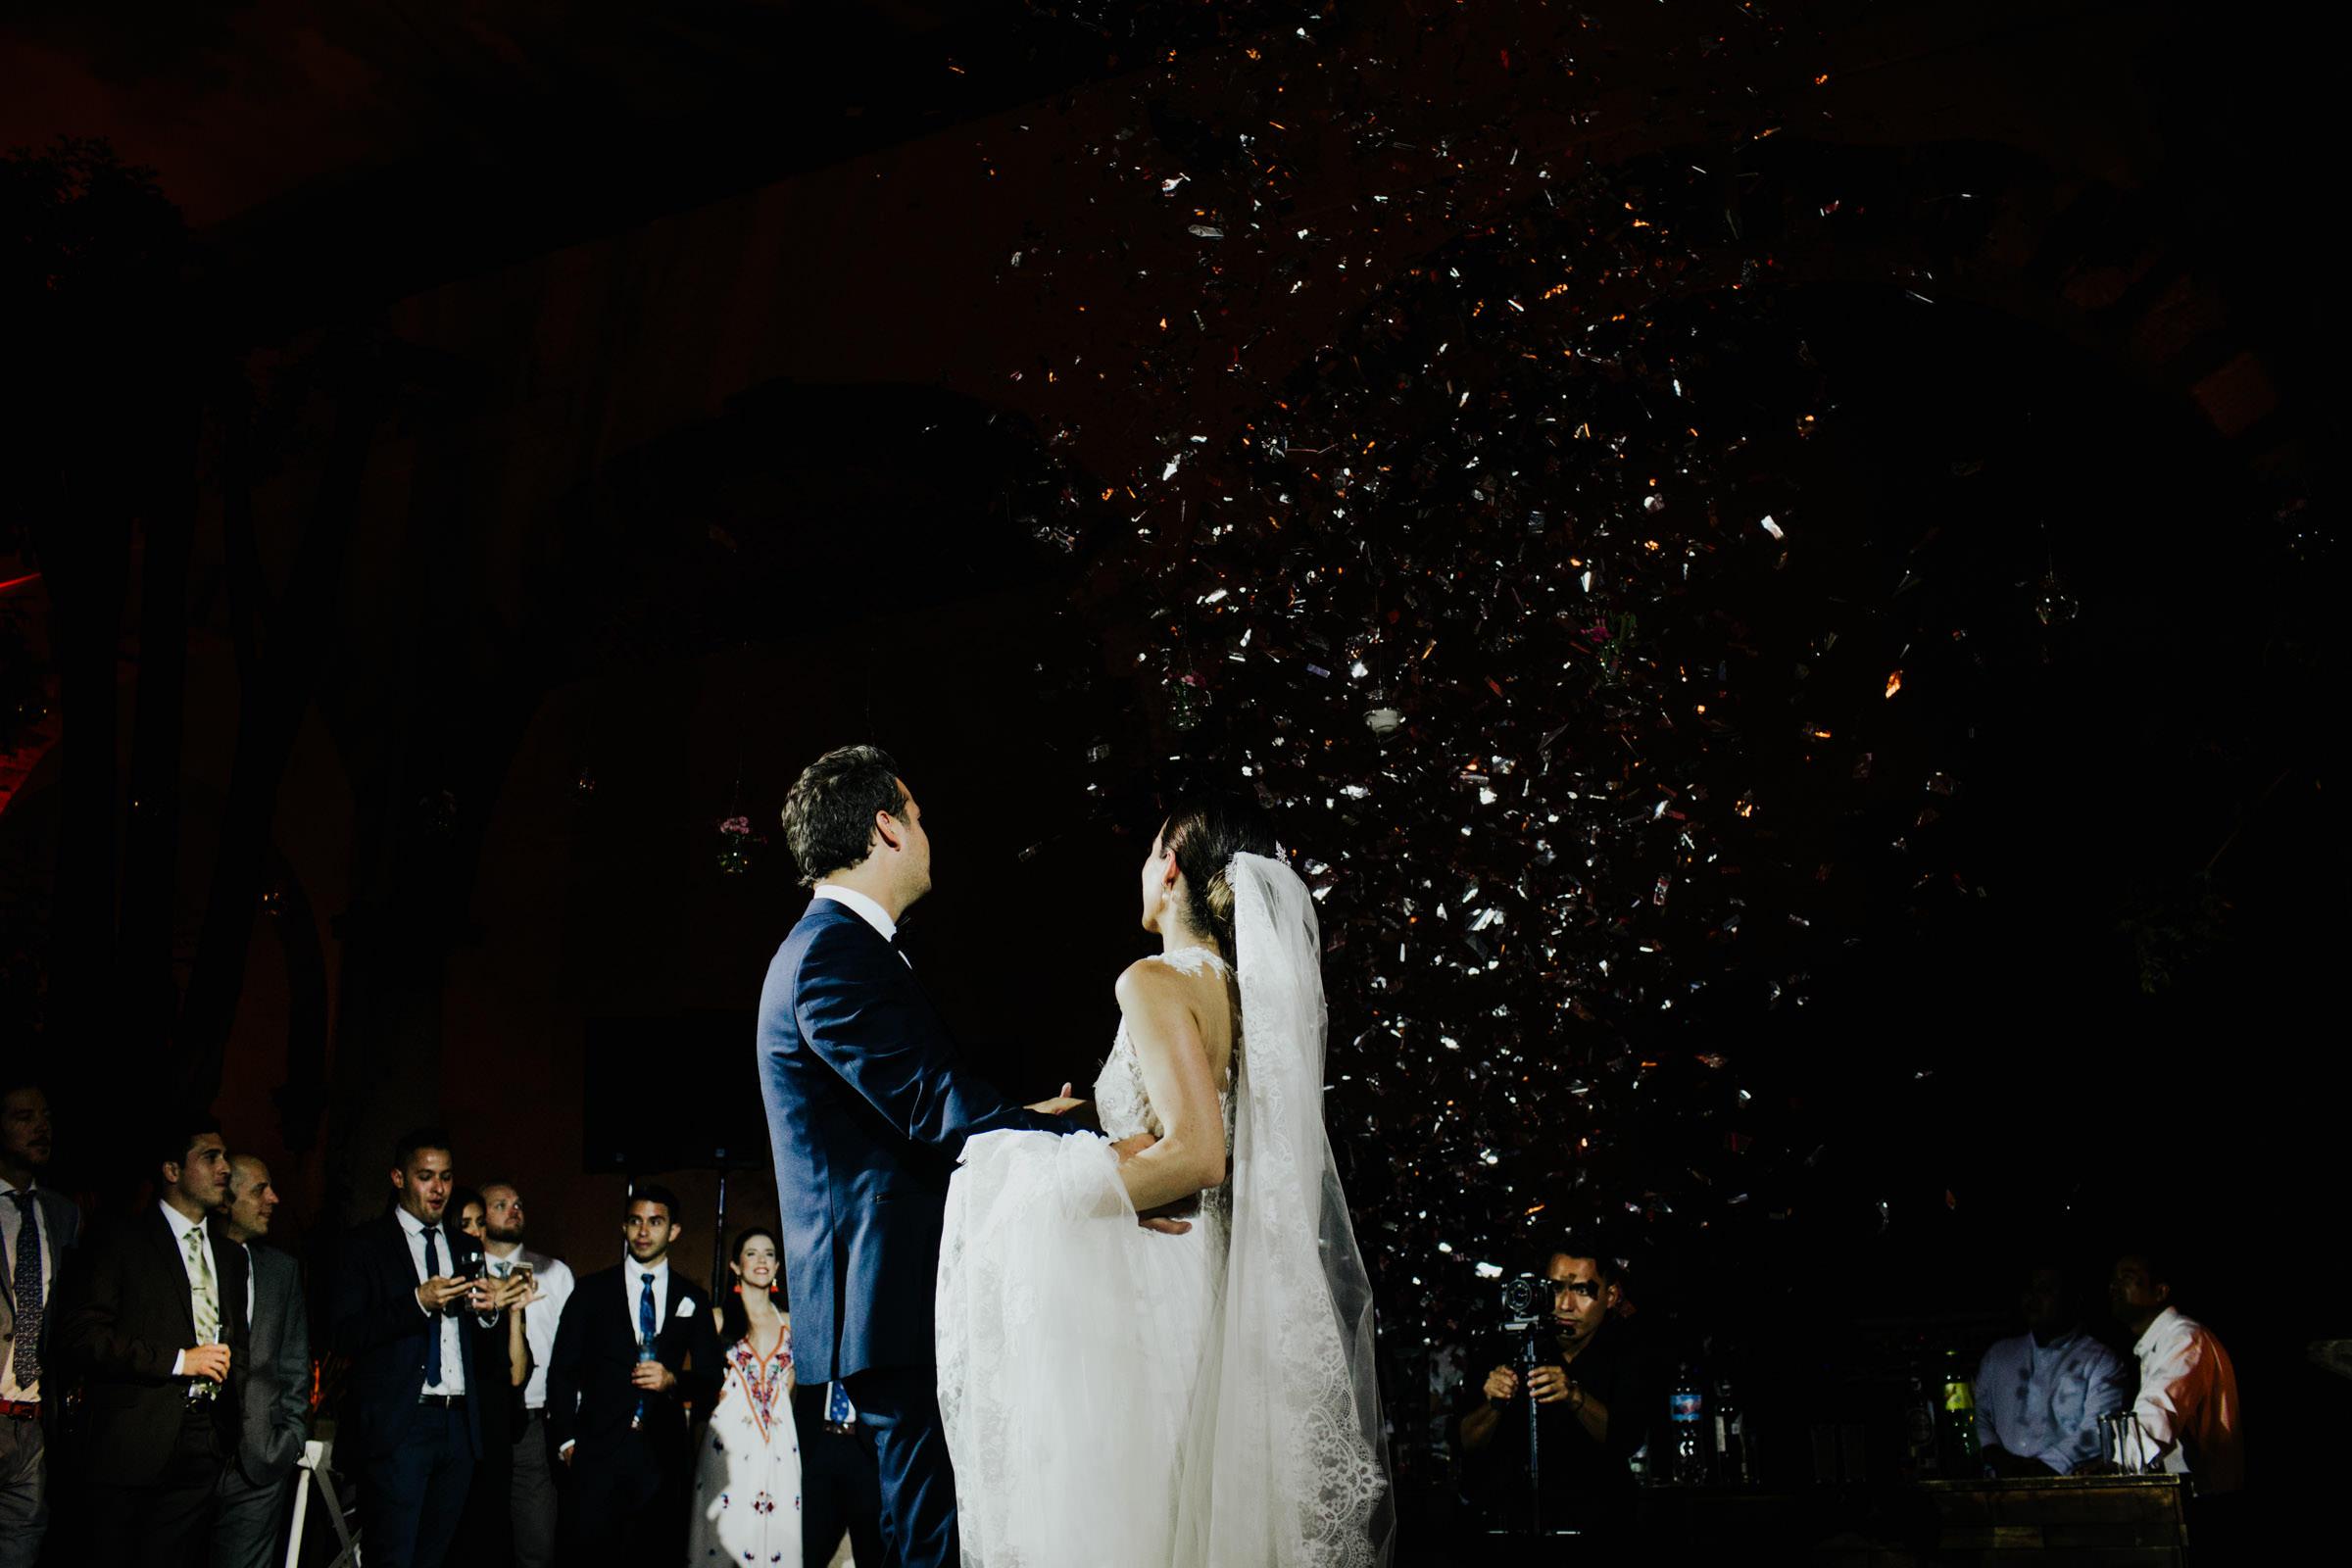 San-Miguel-de-Allende-Wedding-Photography-Parroquia-Instituto-Boda-Fotografia-Fer-Sergio-Pierce-Lifestyle-Photography0042.JPG